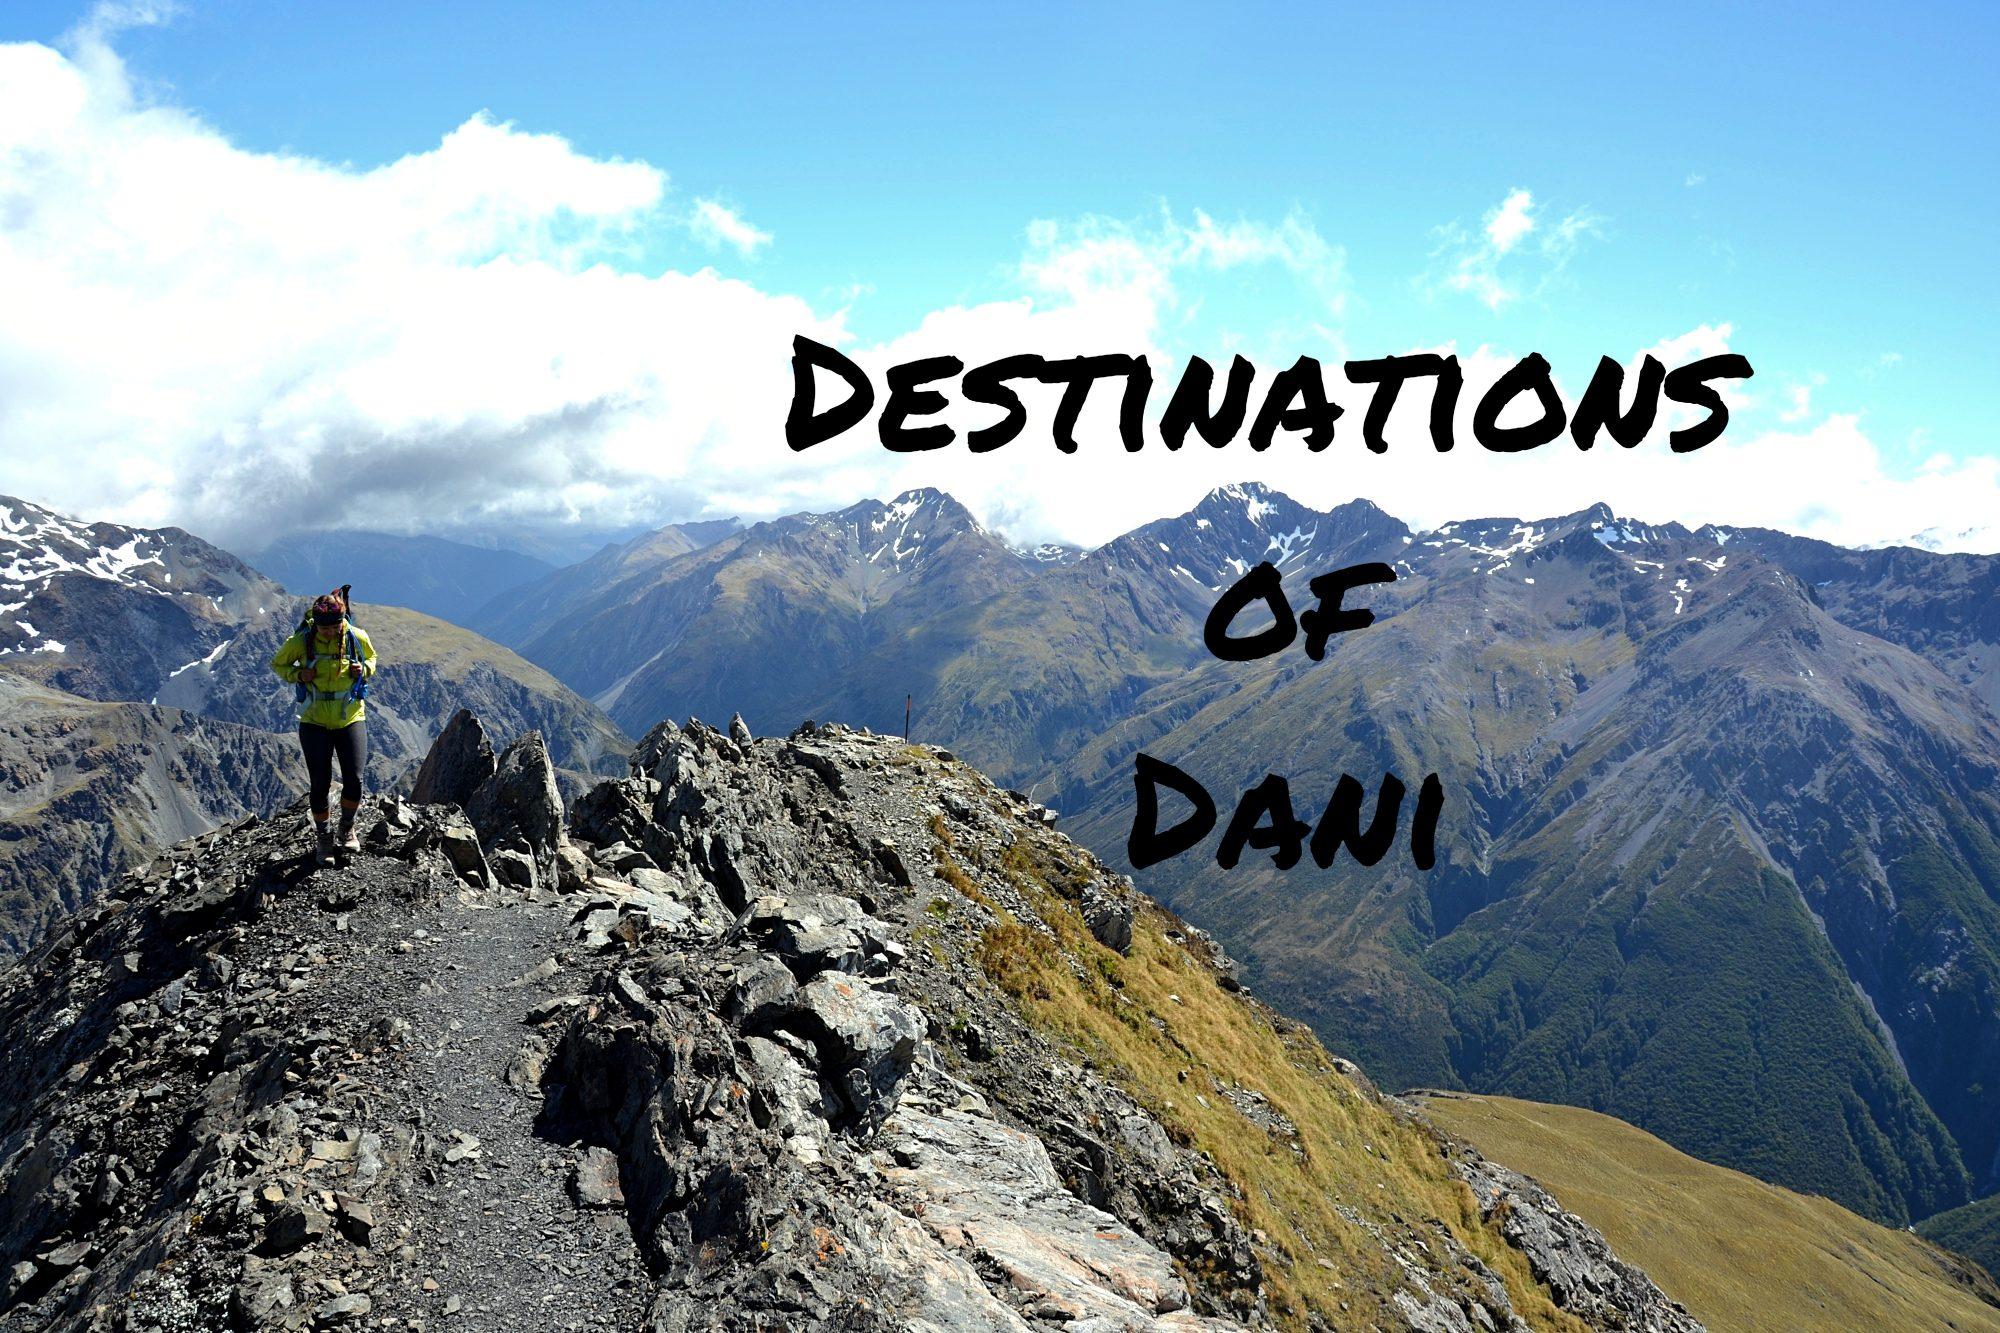 Destinations of Dani